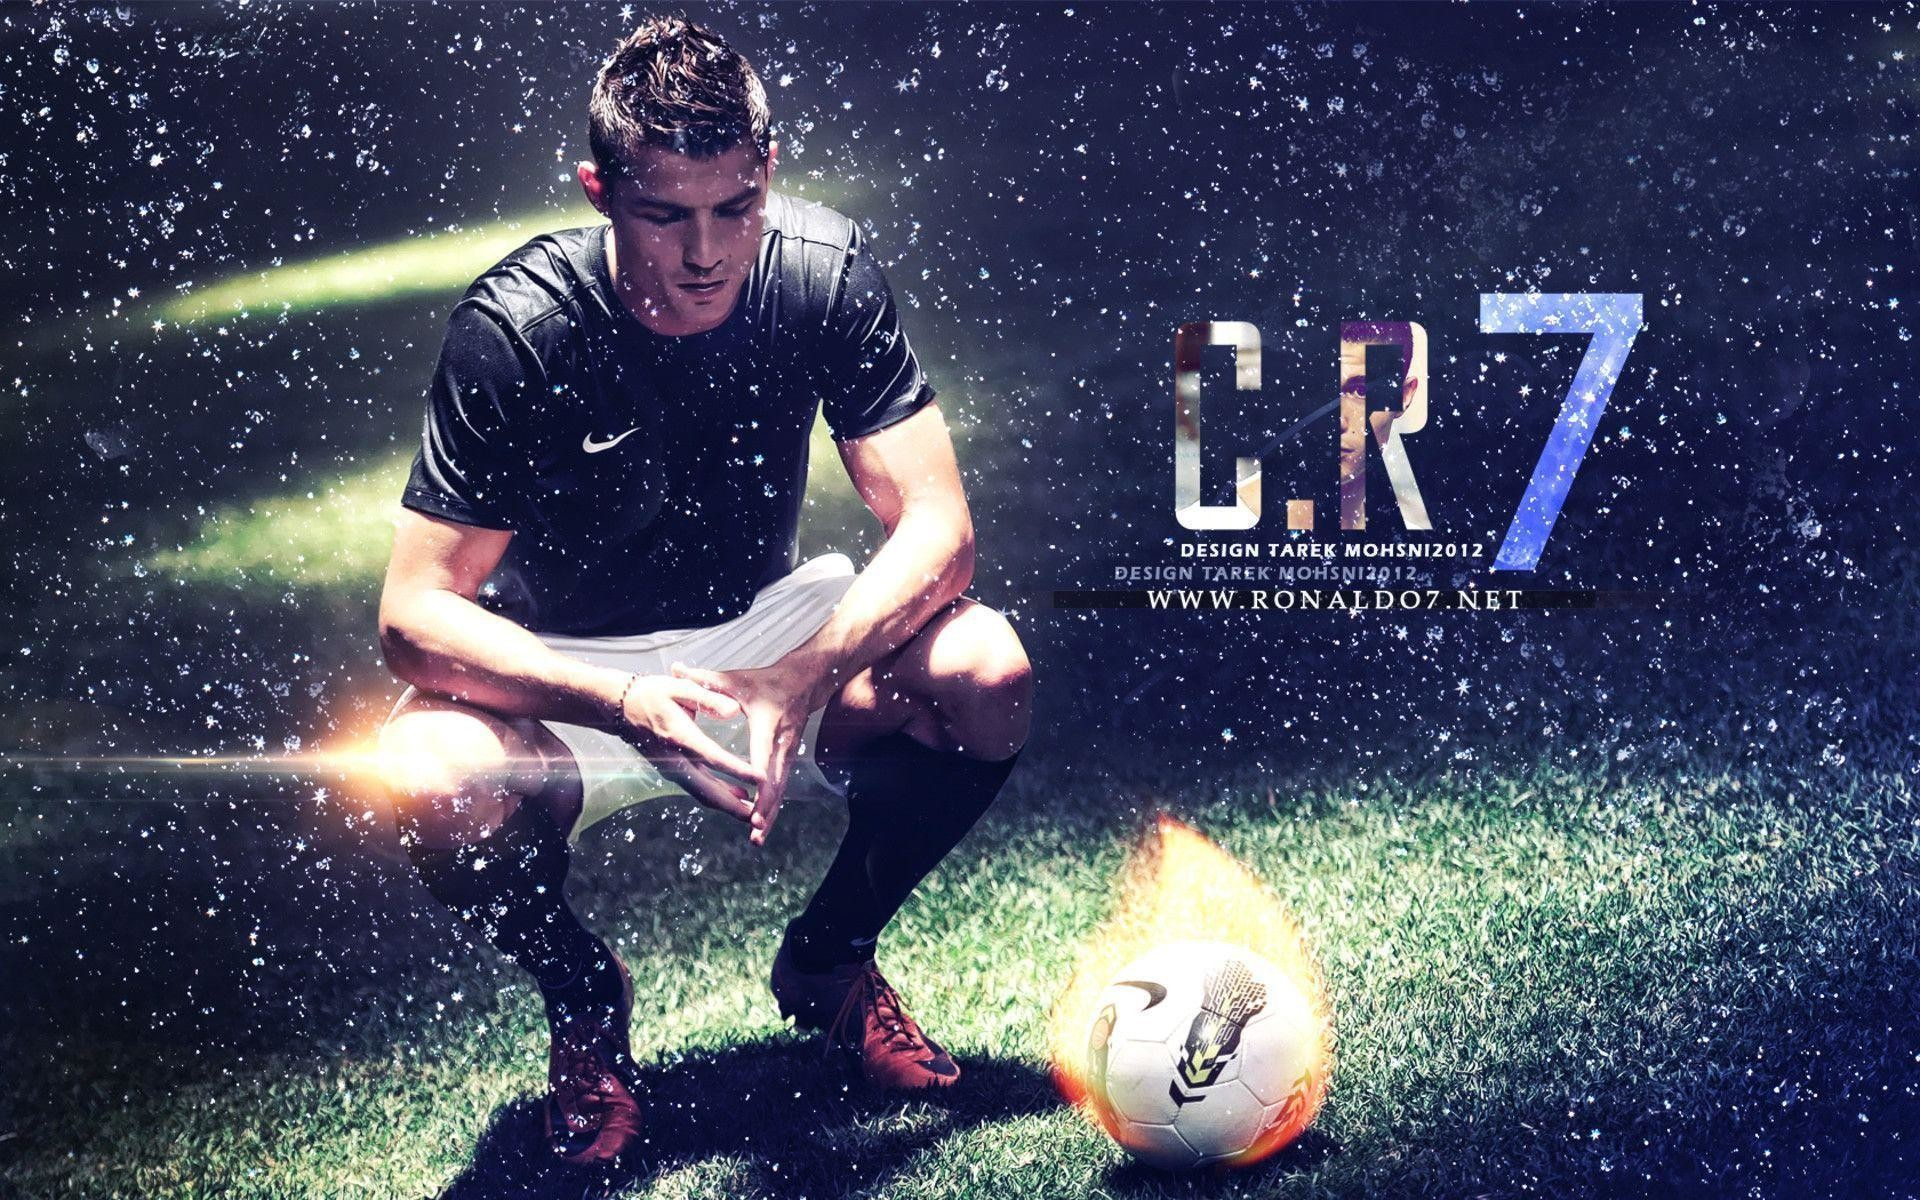 Cristiano Ronaldo Nike wallpaper – Cristiano Ronaldo Wallpapers